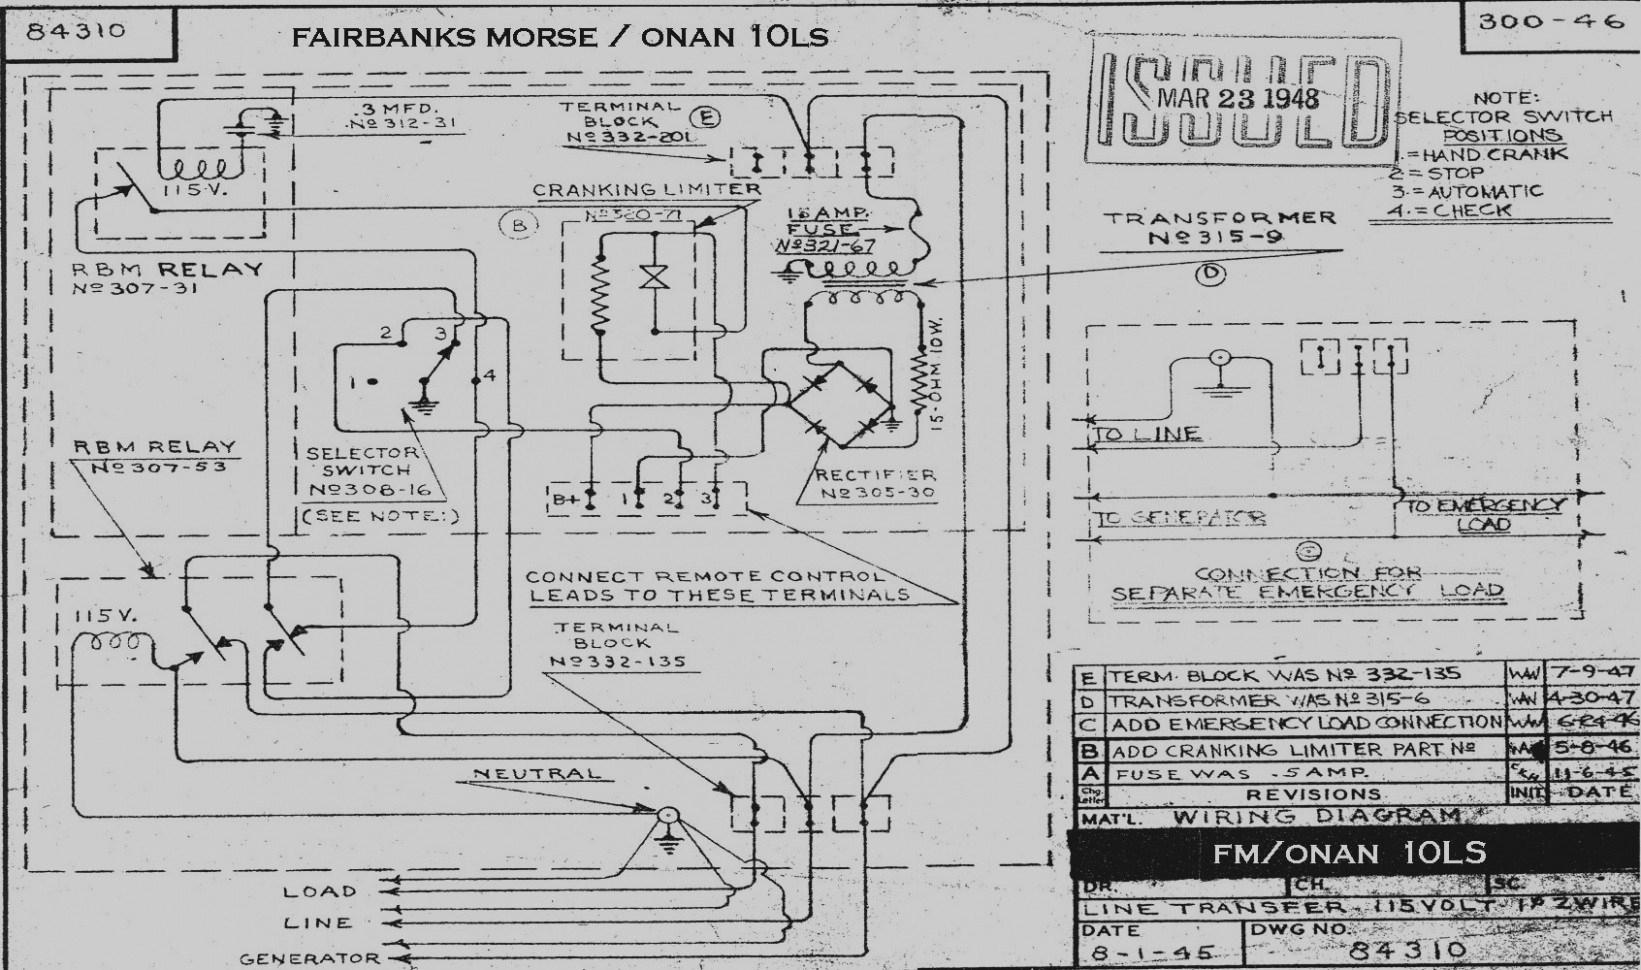 Onan Emerald Generator Wiring Diagram Ther With - All Wiring Diagram - Onan Rv Generator Wiring Diagram